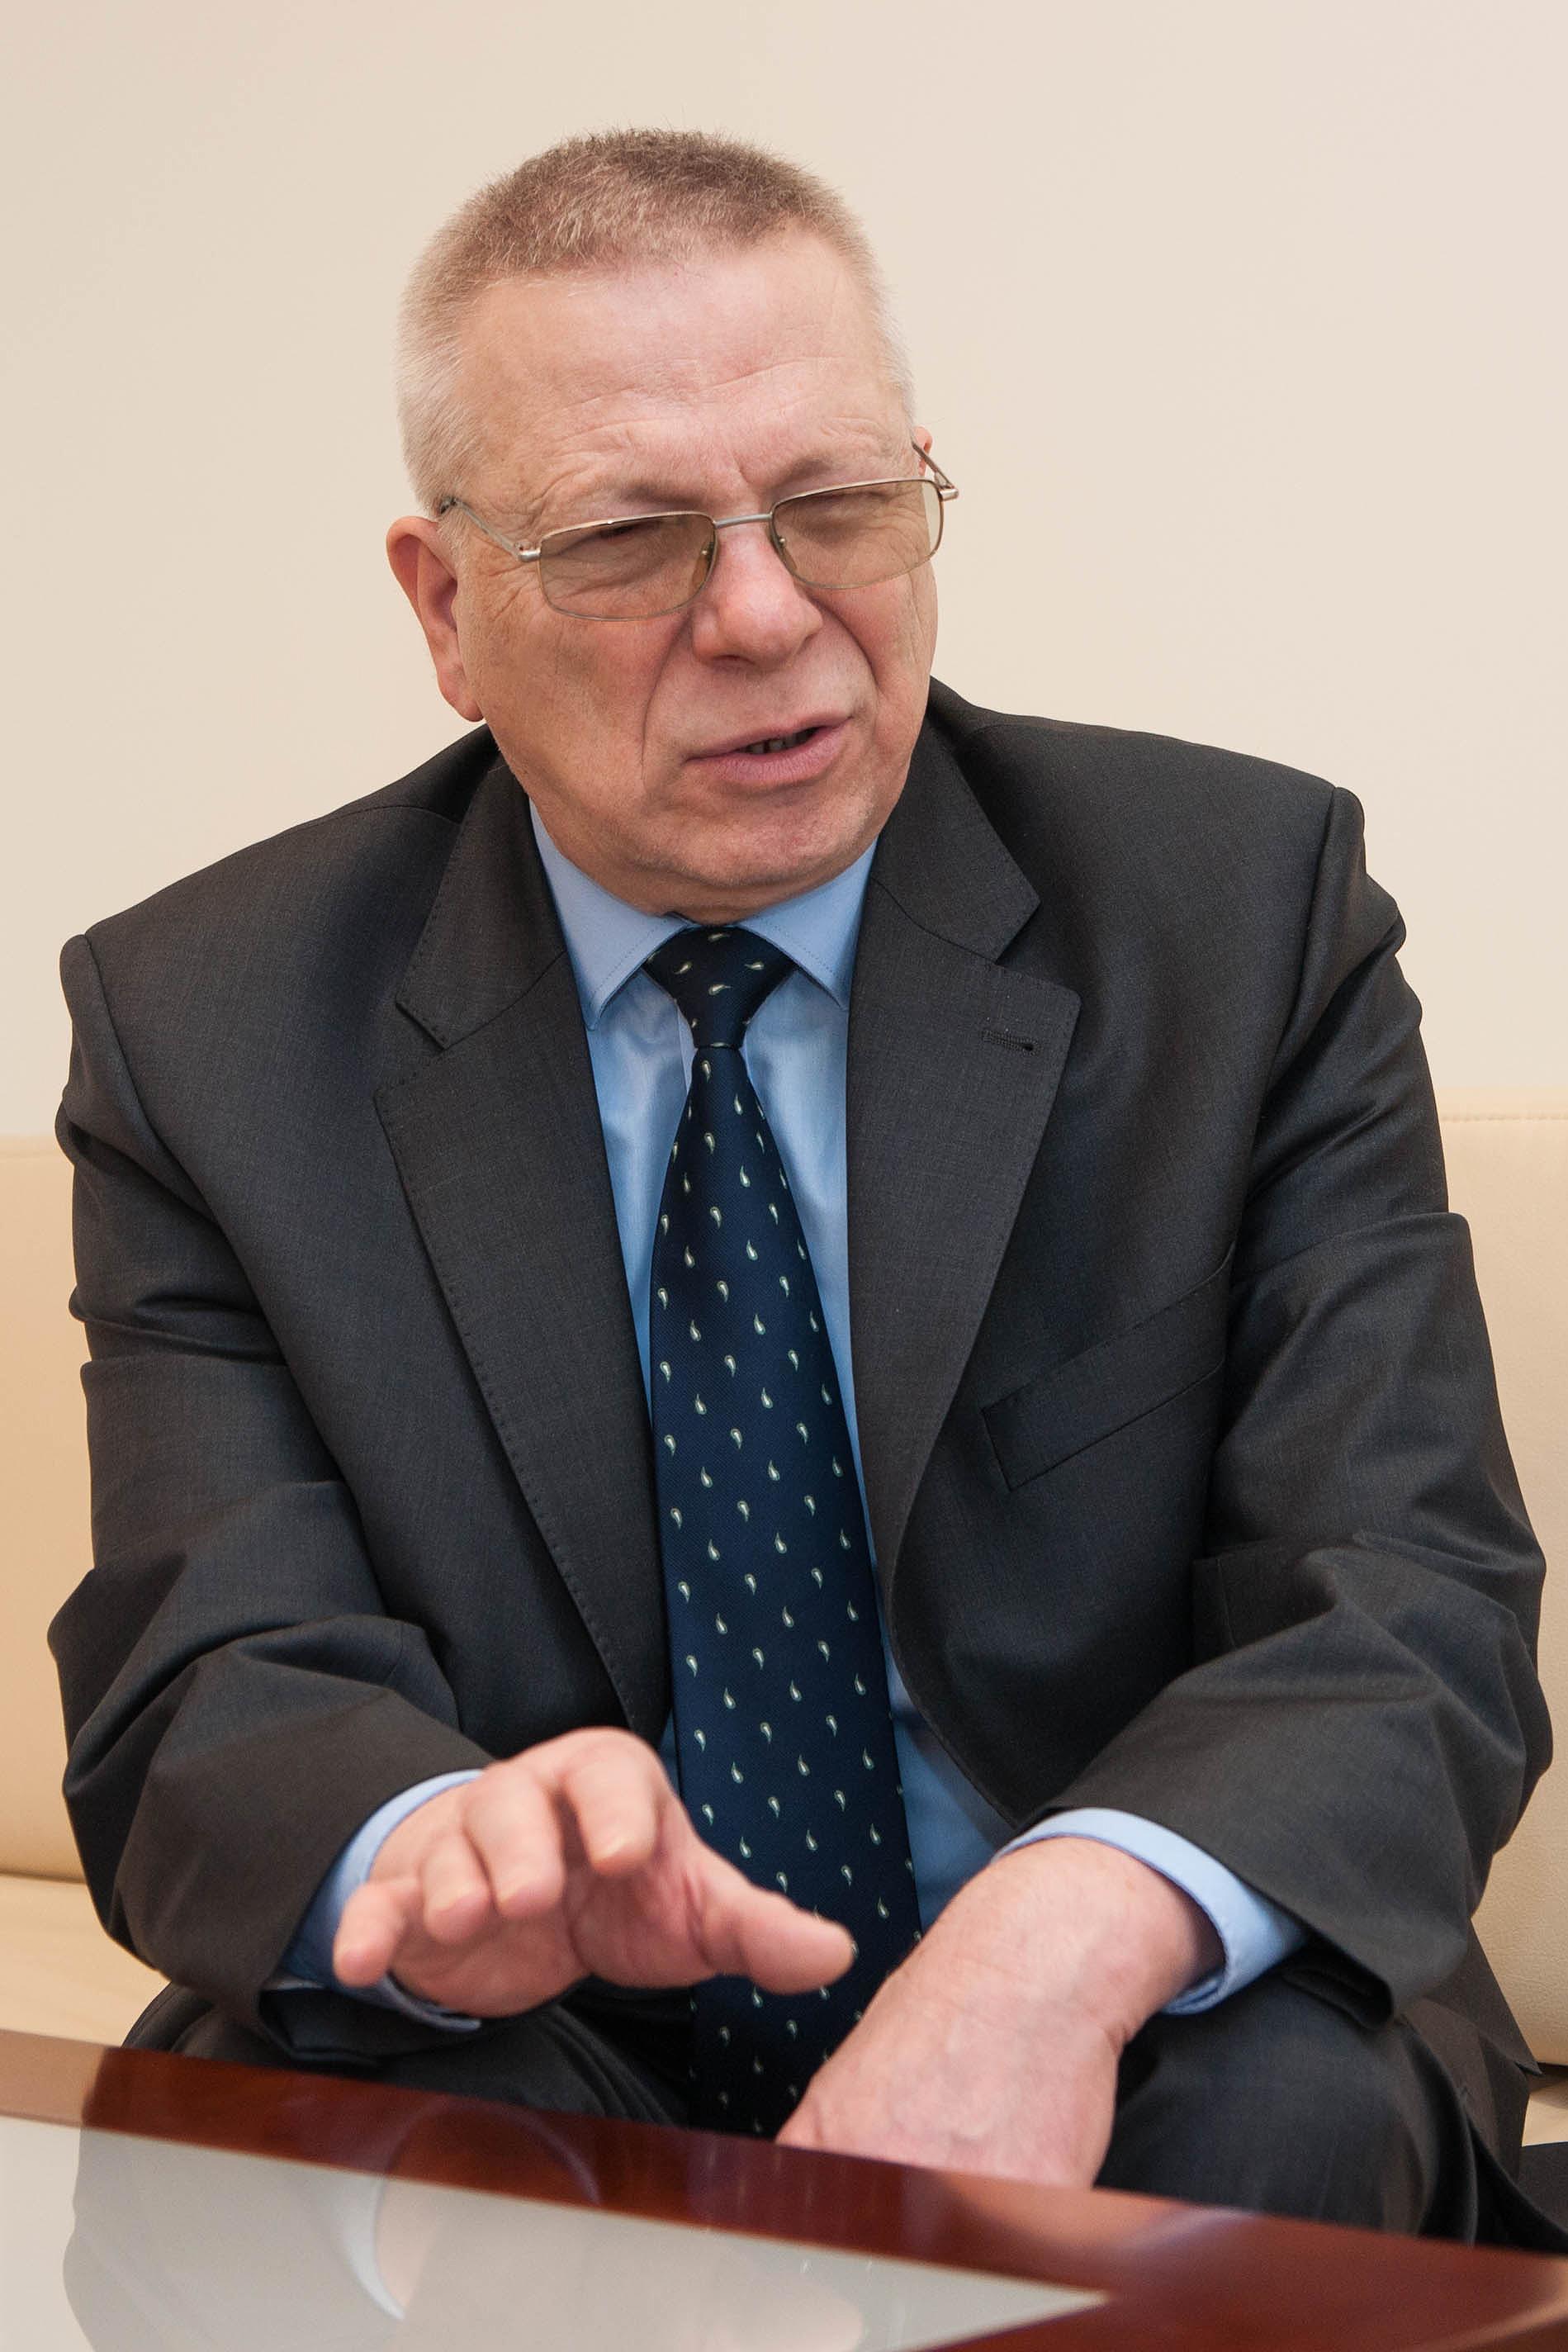 Roman Giedrojć